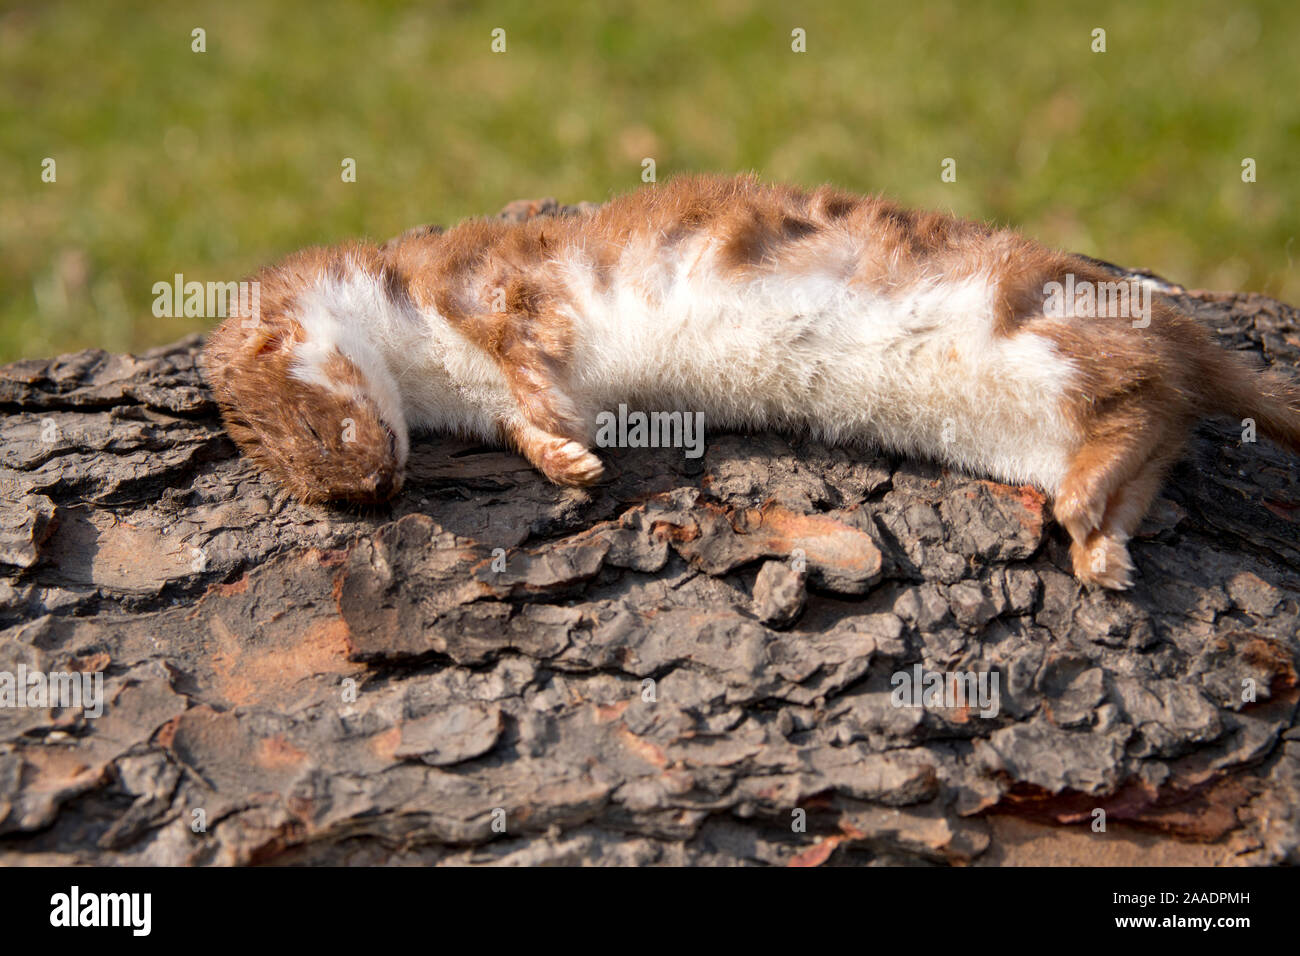 totes Mauswiesel, Mustela nivalis, Überfamilie Hundeartige (Canoidea), Marderverwandte (Musteloidea), Familie Marder (Mustelidae), Unterfamilie Mustel Stock Photo